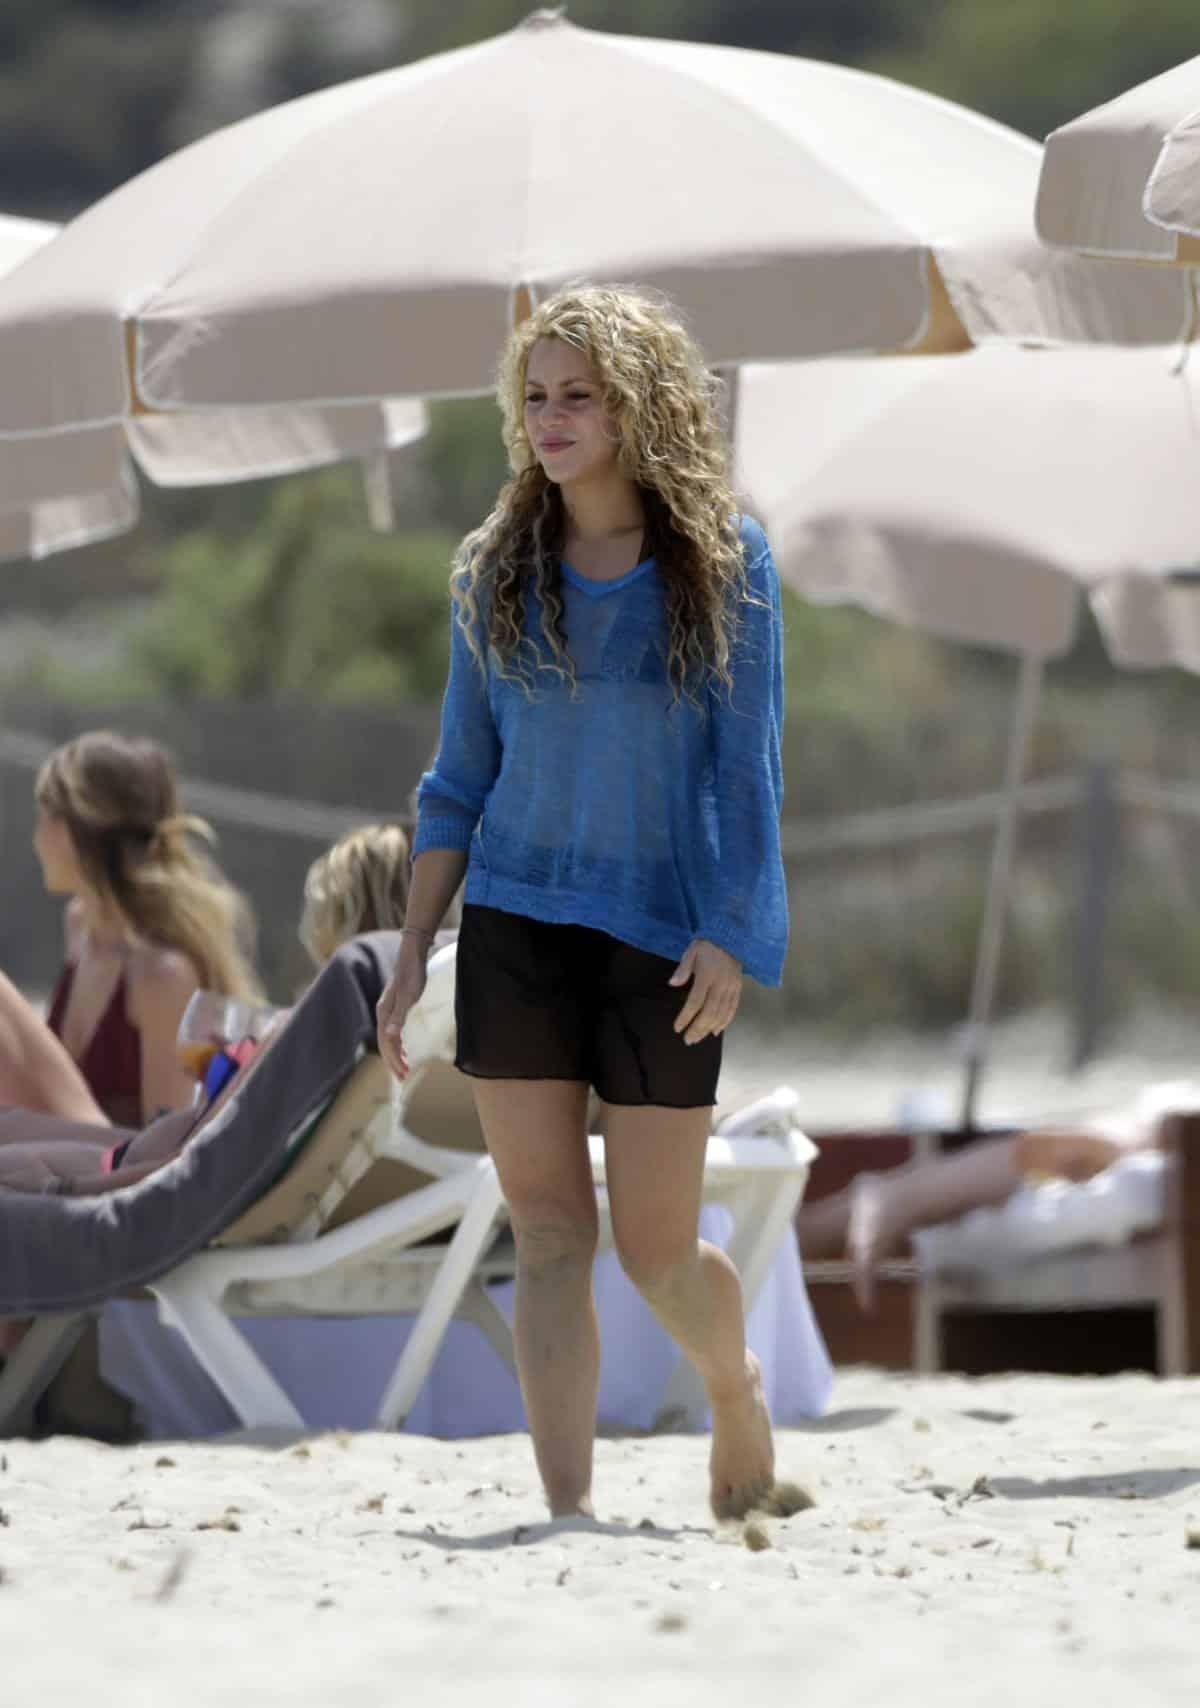 Hollywood Celebrities Beach Outfits 30 Top Celebs In Beachwear